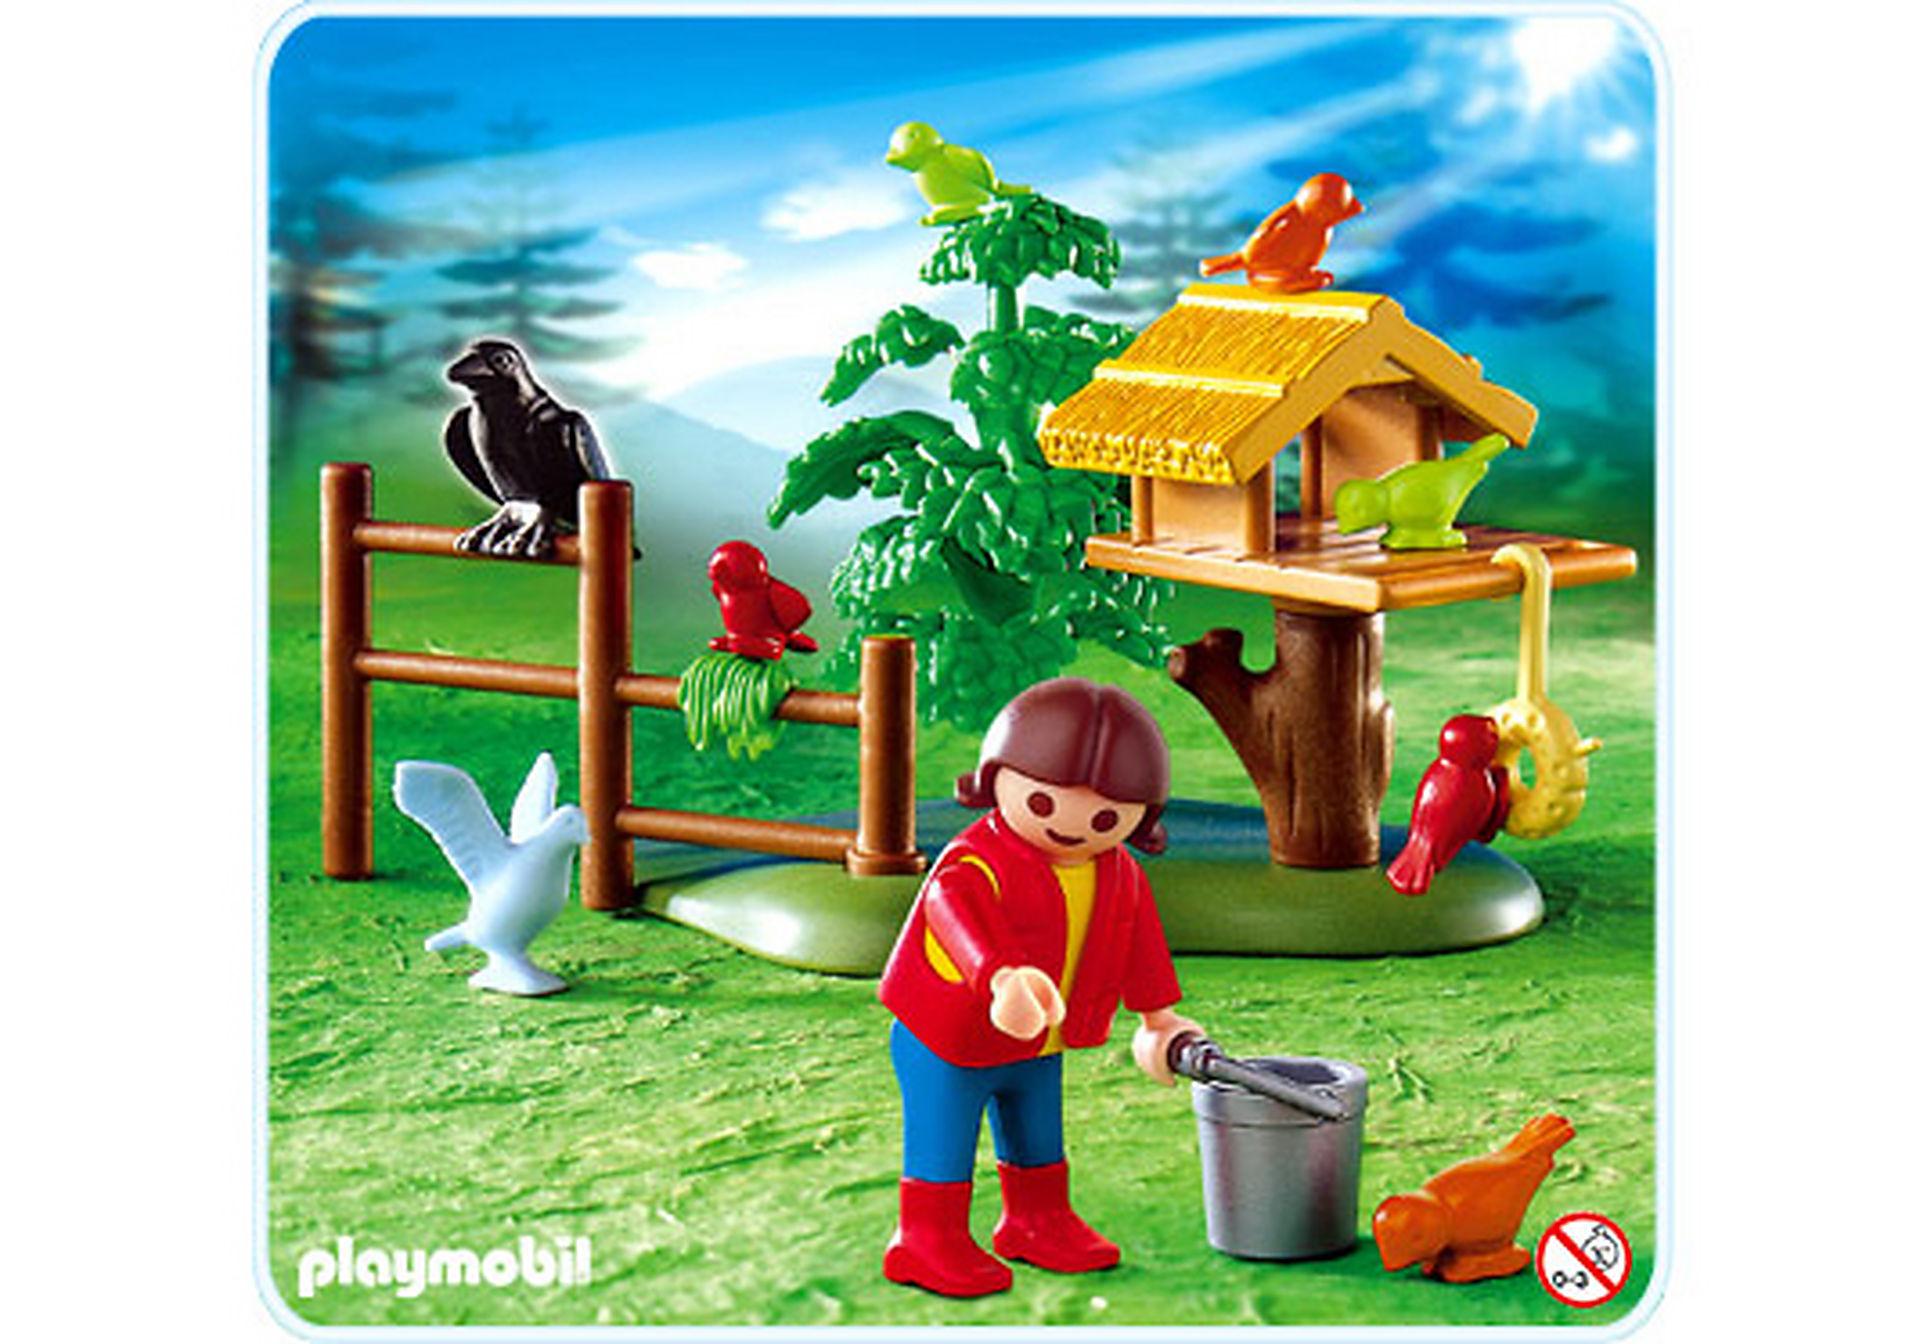 http://media.playmobil.com/i/playmobil/4203-A_product_detail/Enfants / oiseaux / nid